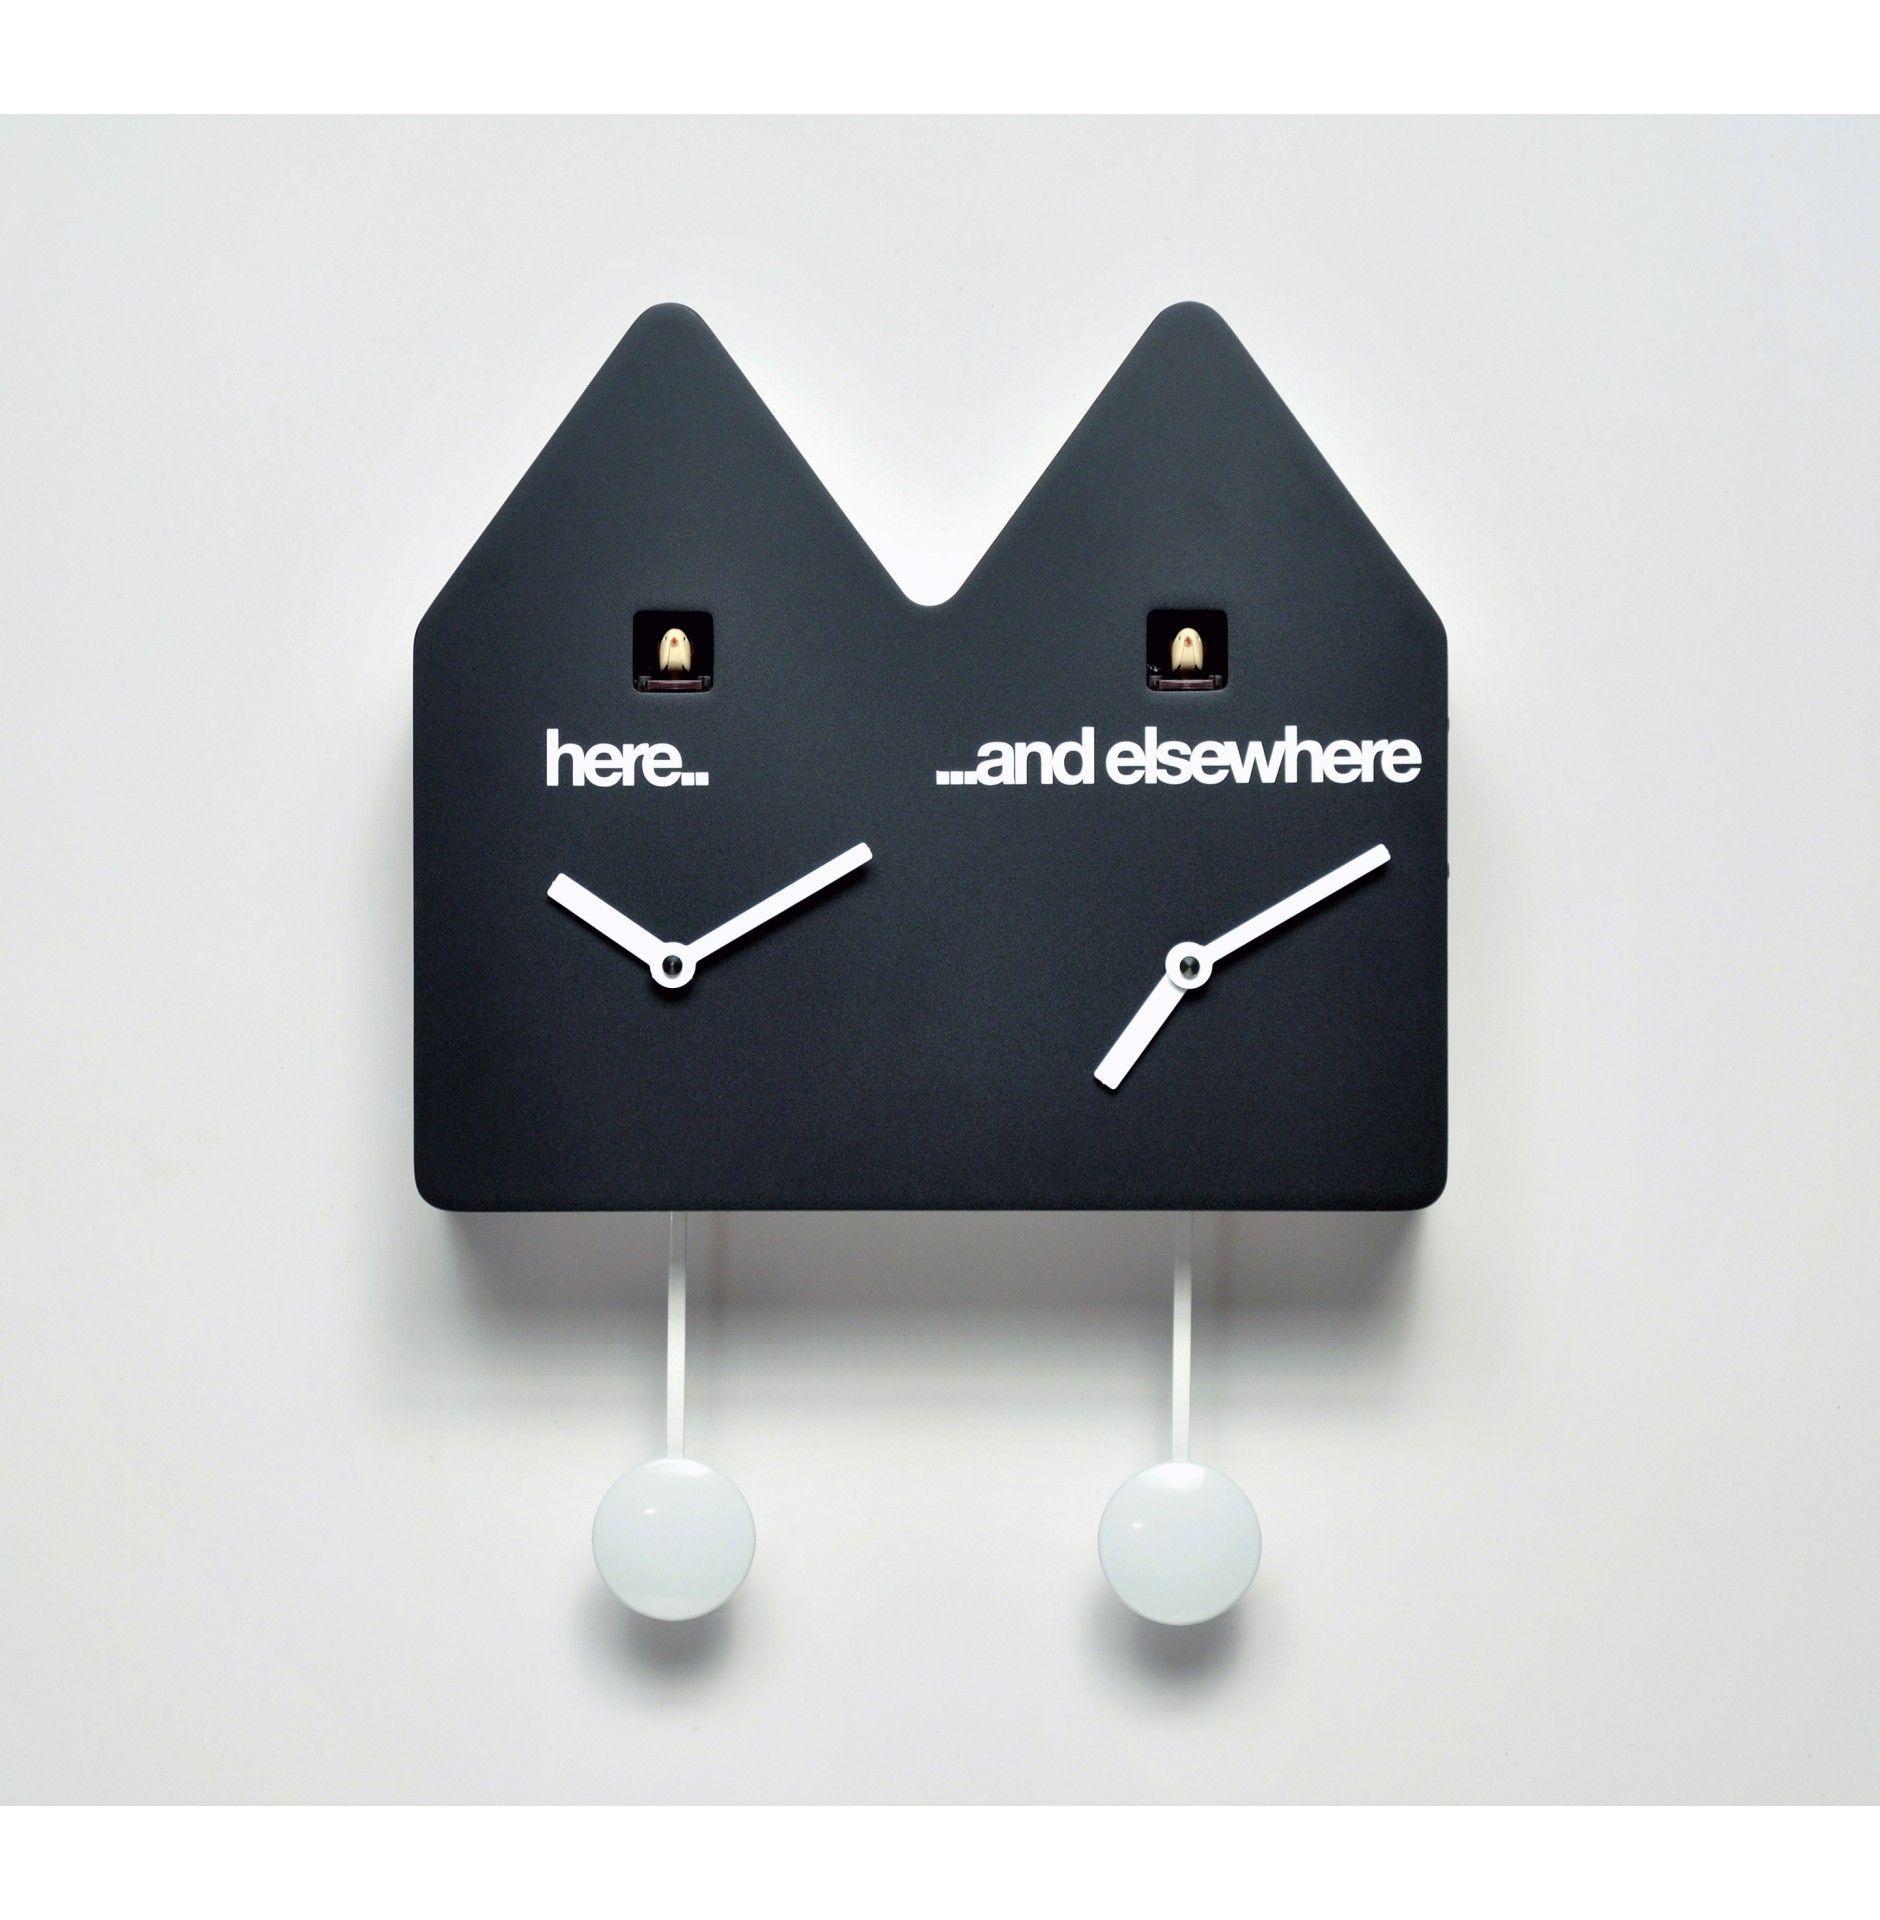 modern cuckoo clock interior design decor  cool clocks  - modern cuckoo clock interior design decor